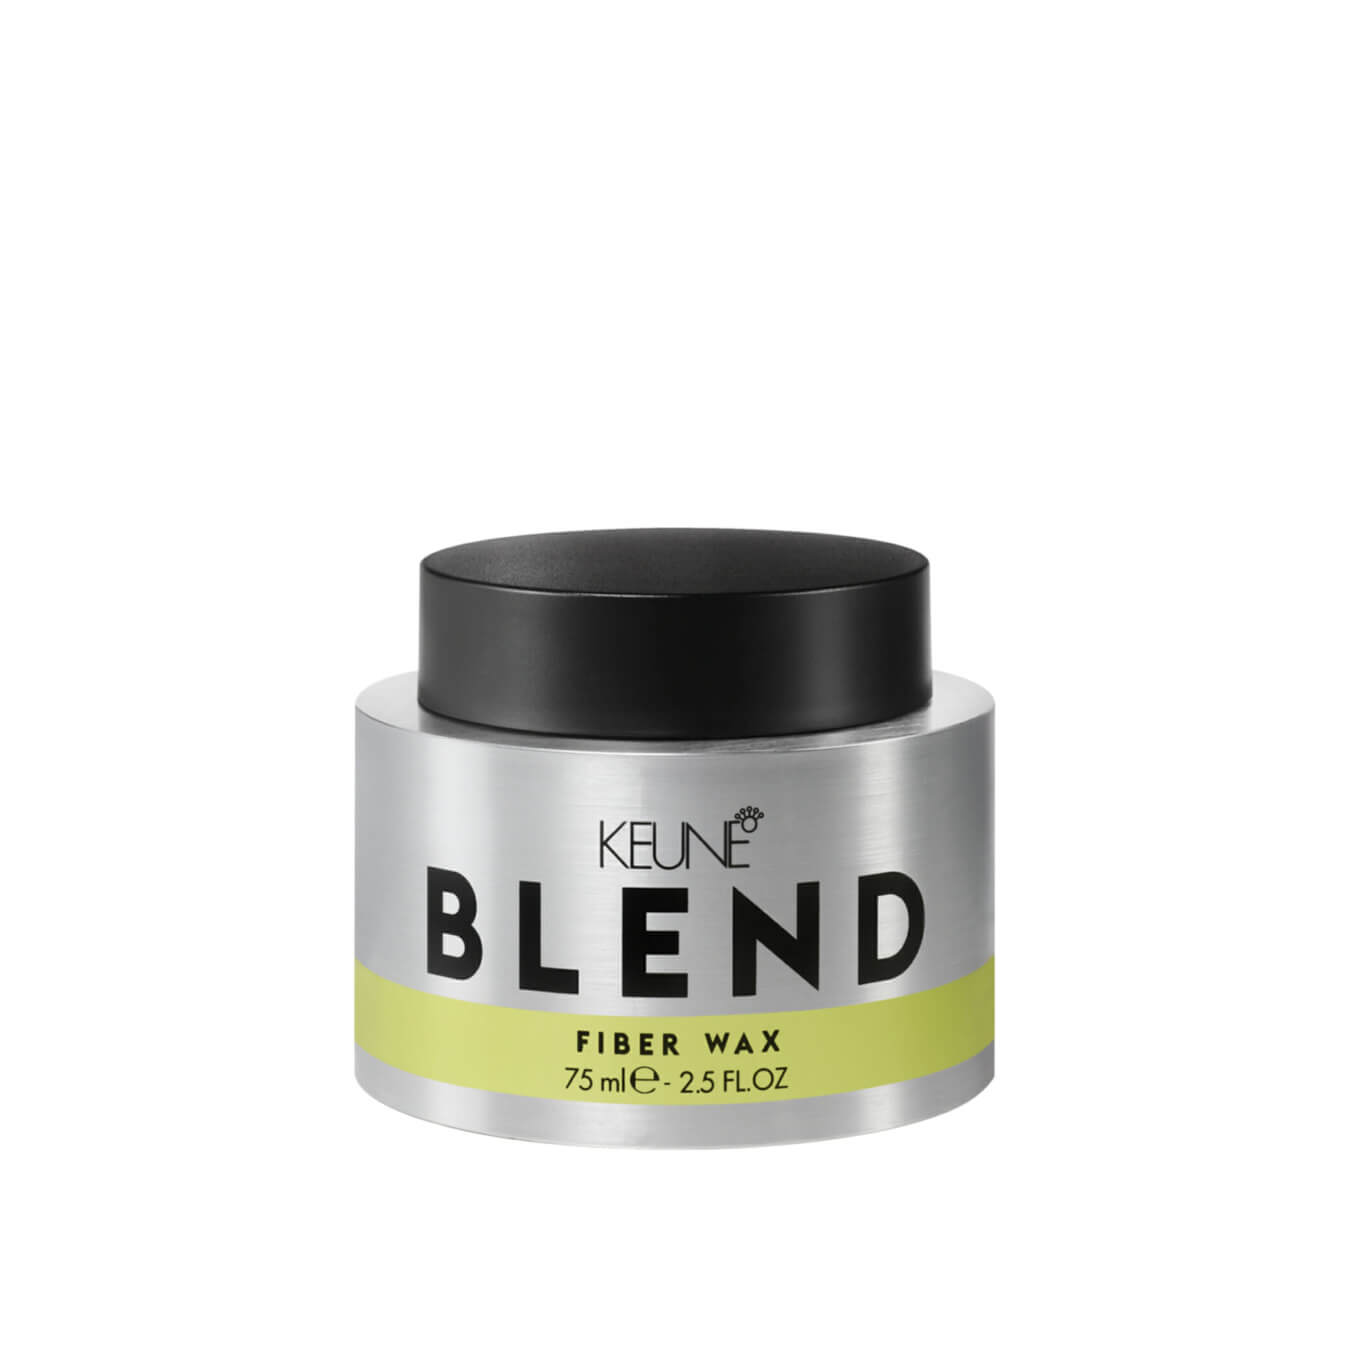 Koop Keune Blend Fiber Wax 75ml